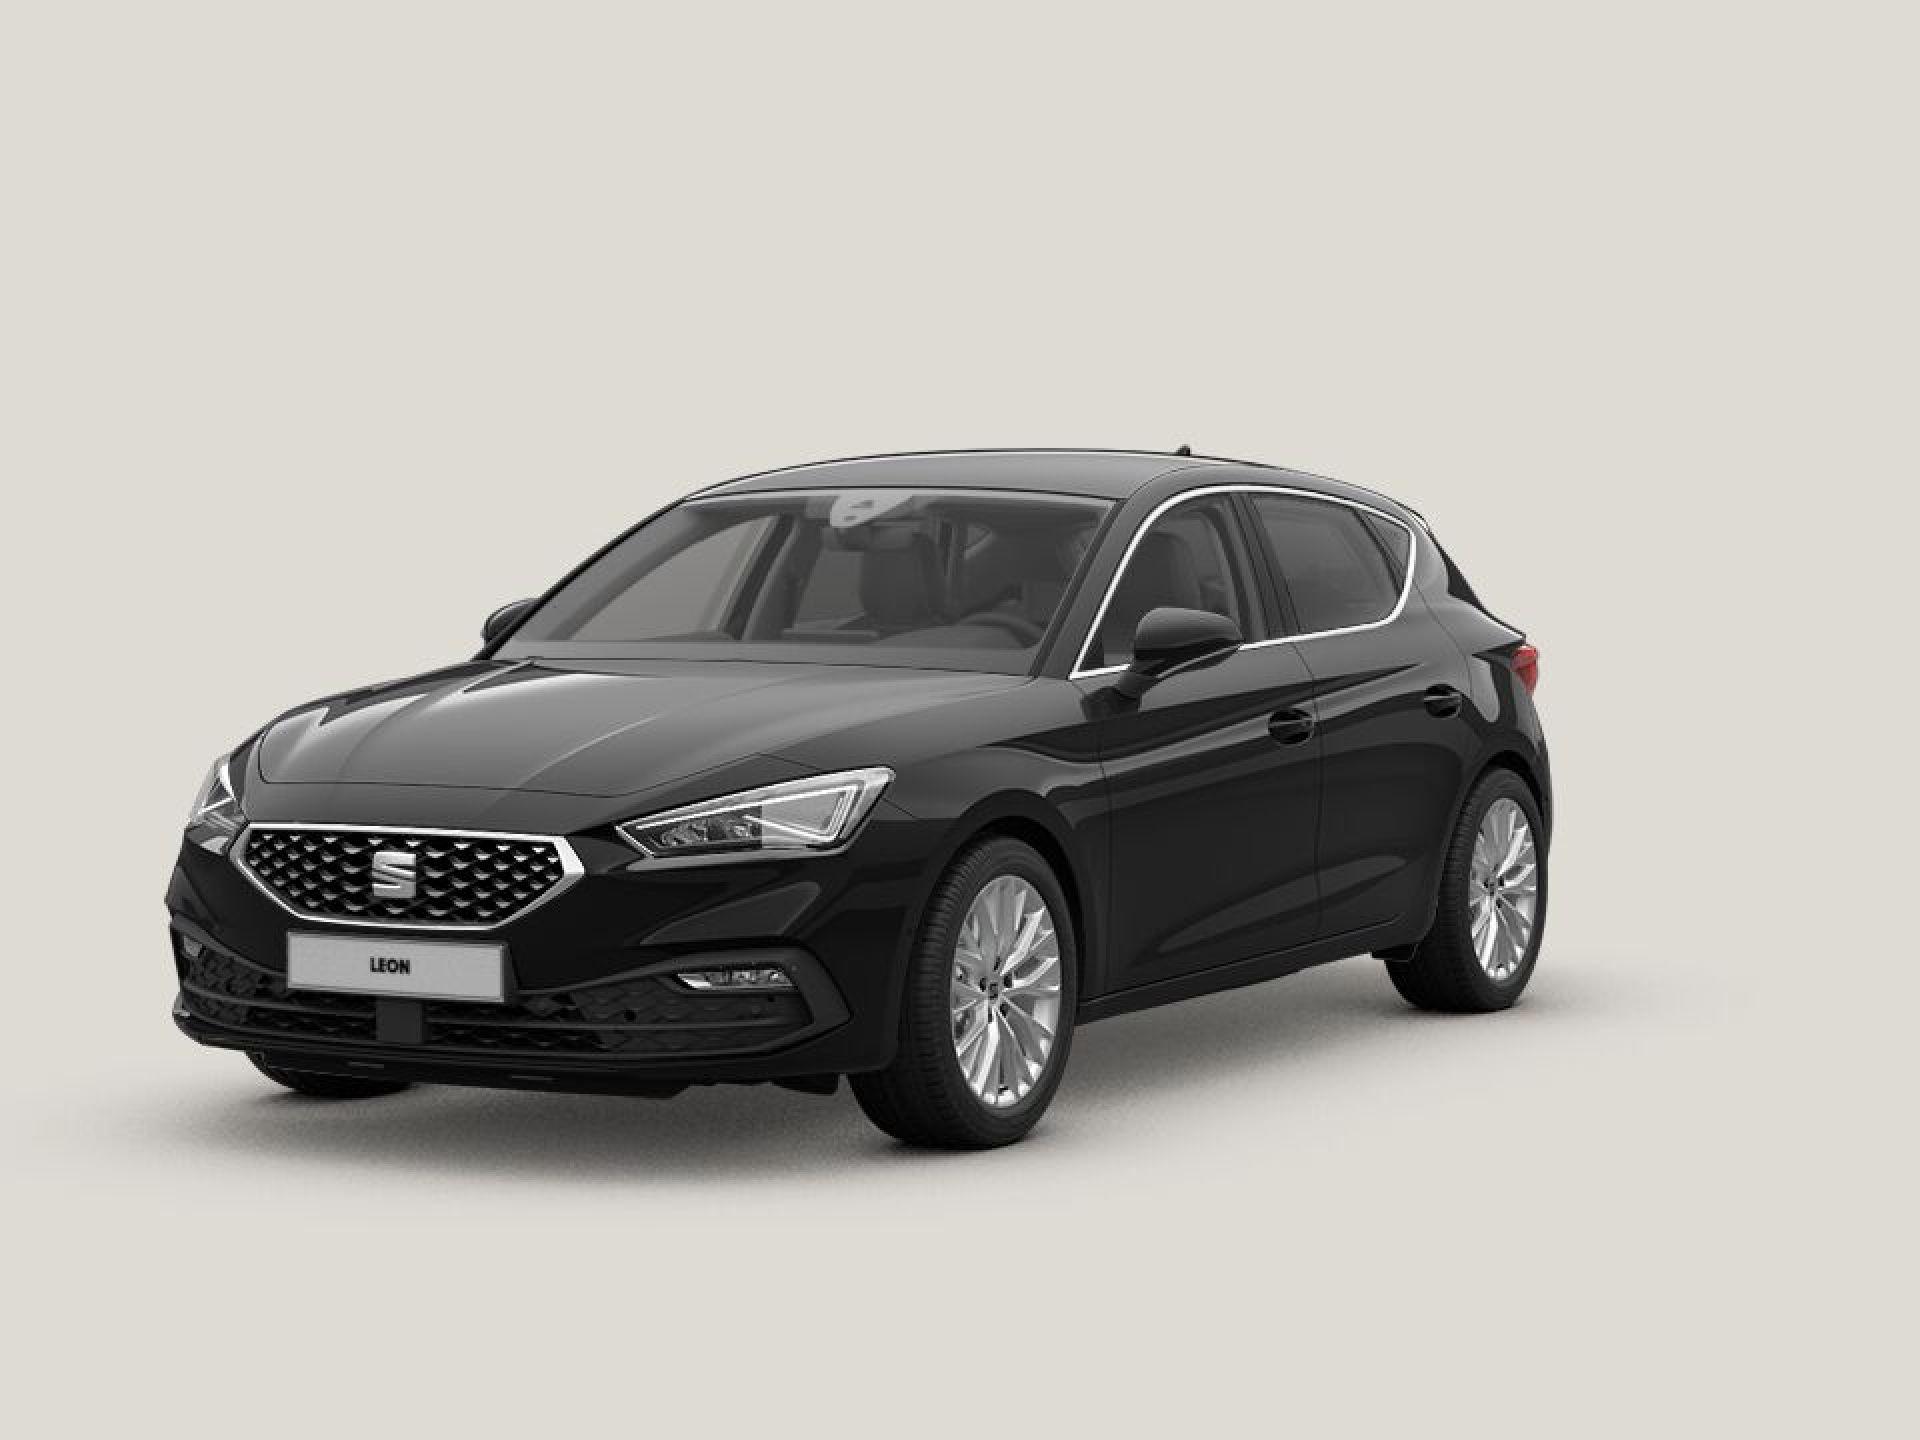 SEAT Nuevo León 1.5 eTSI 110kW DSG-7 S&S Xcel Launch P L nuevo Madrid